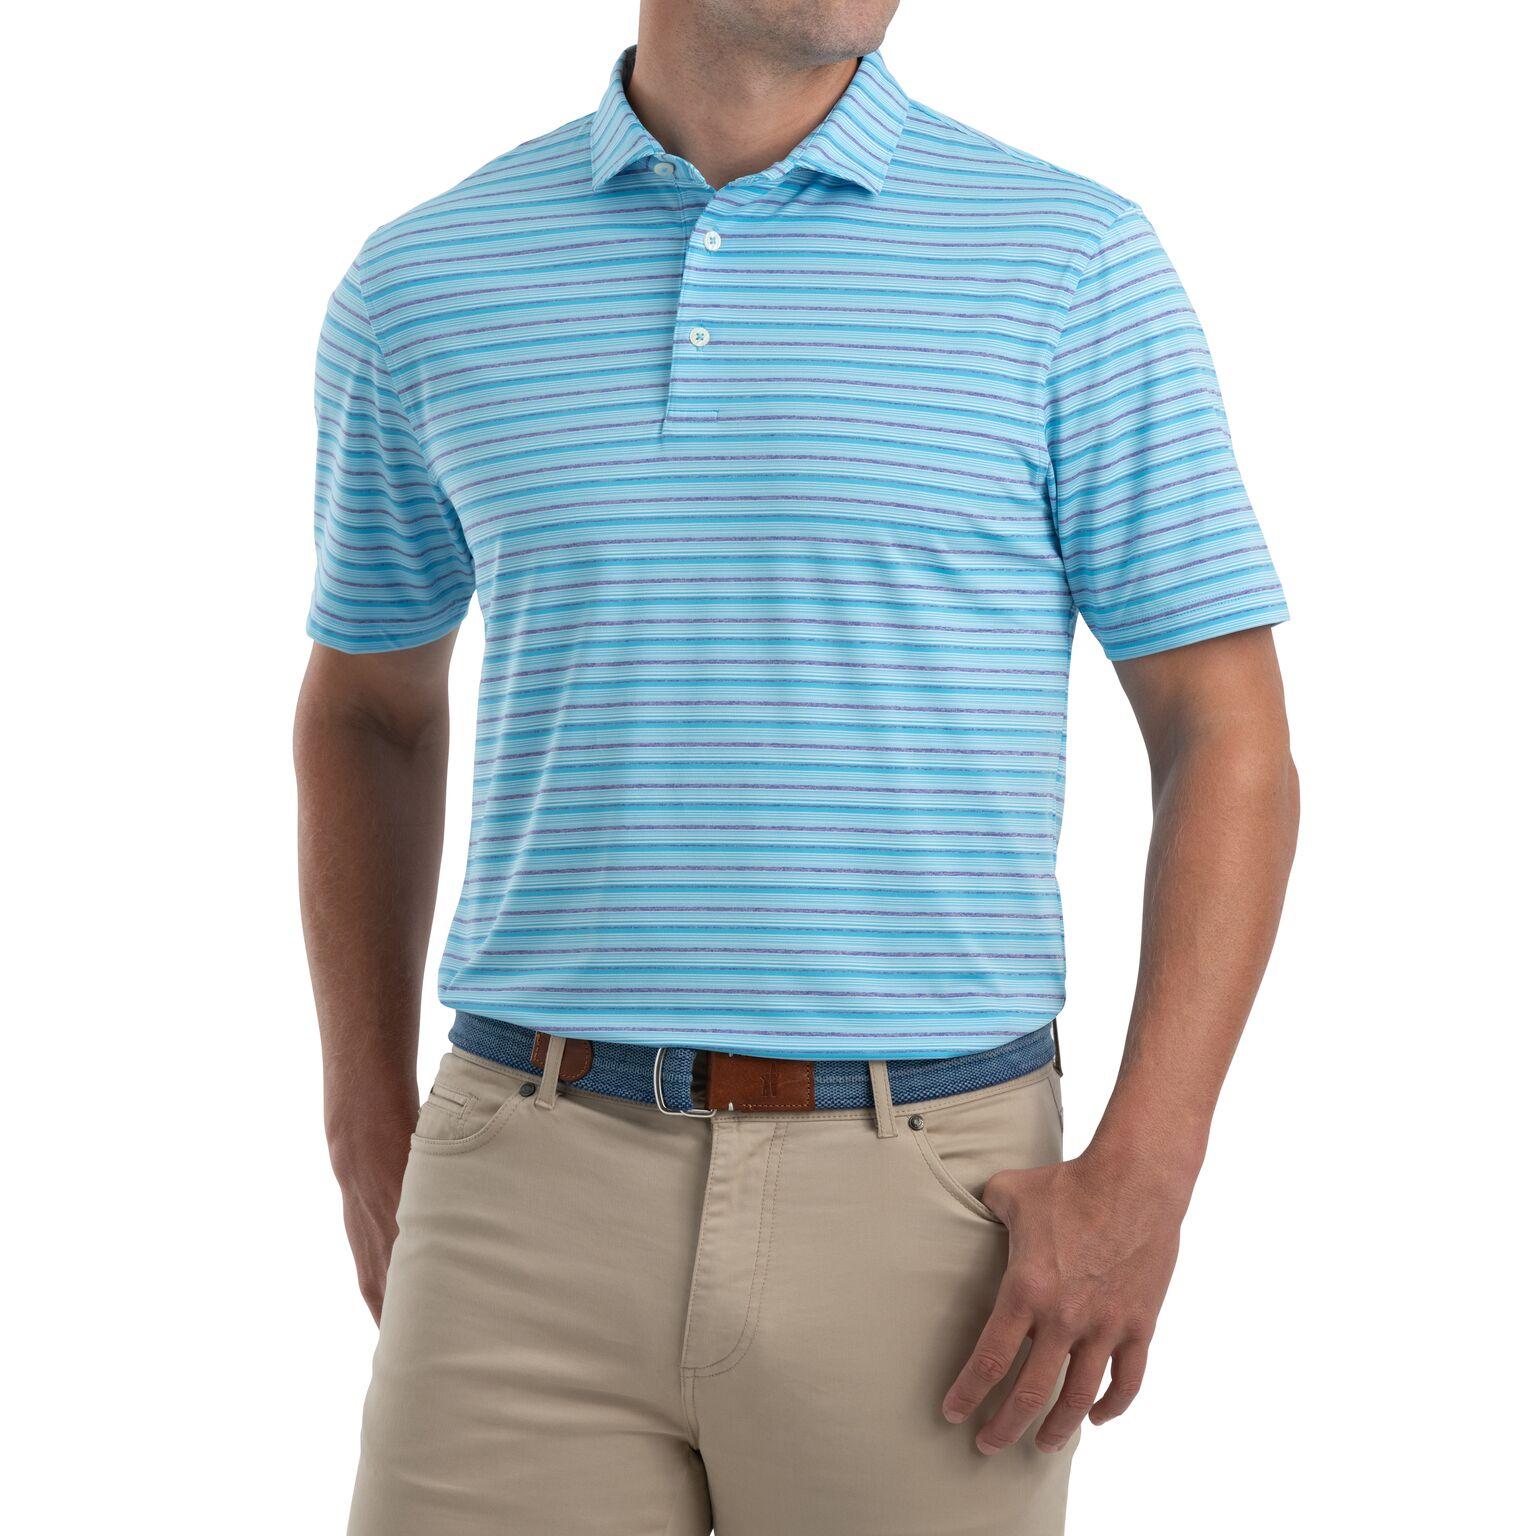 Kane Striped PREP-FORMANCE Jersey Polo (Niagara)